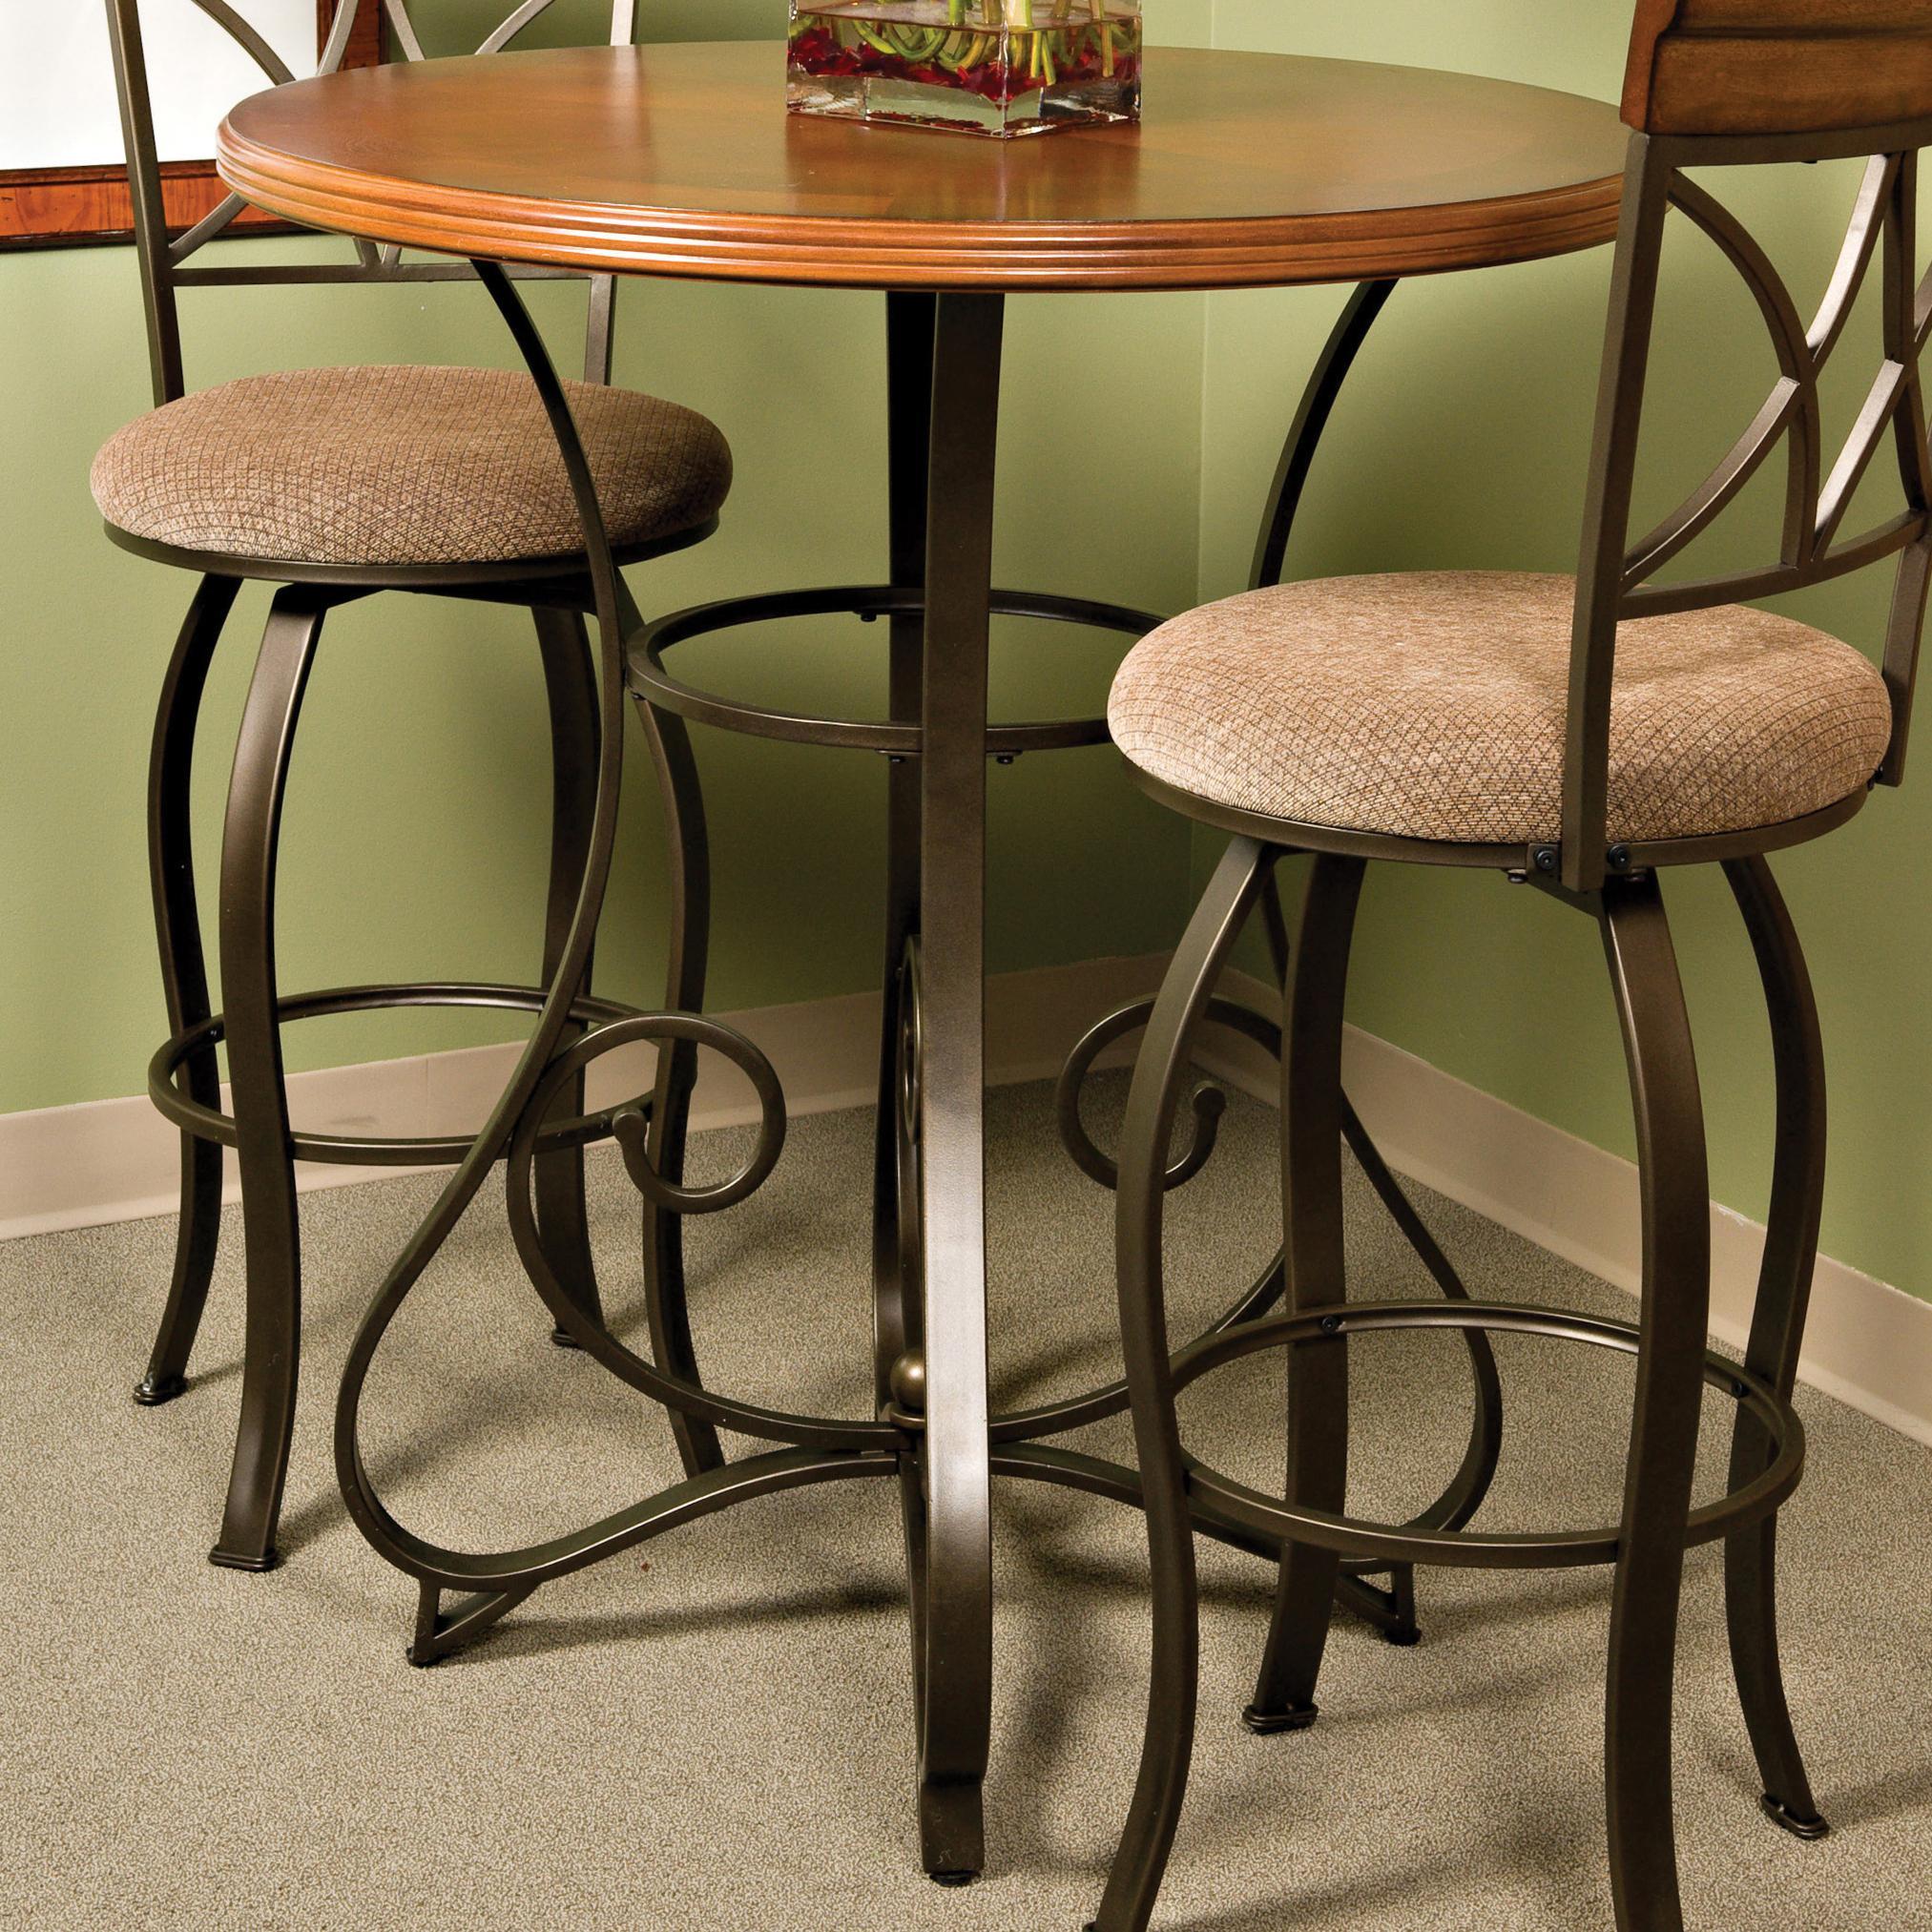 Powell Hamilton Pub Table - Item Number: 697-404